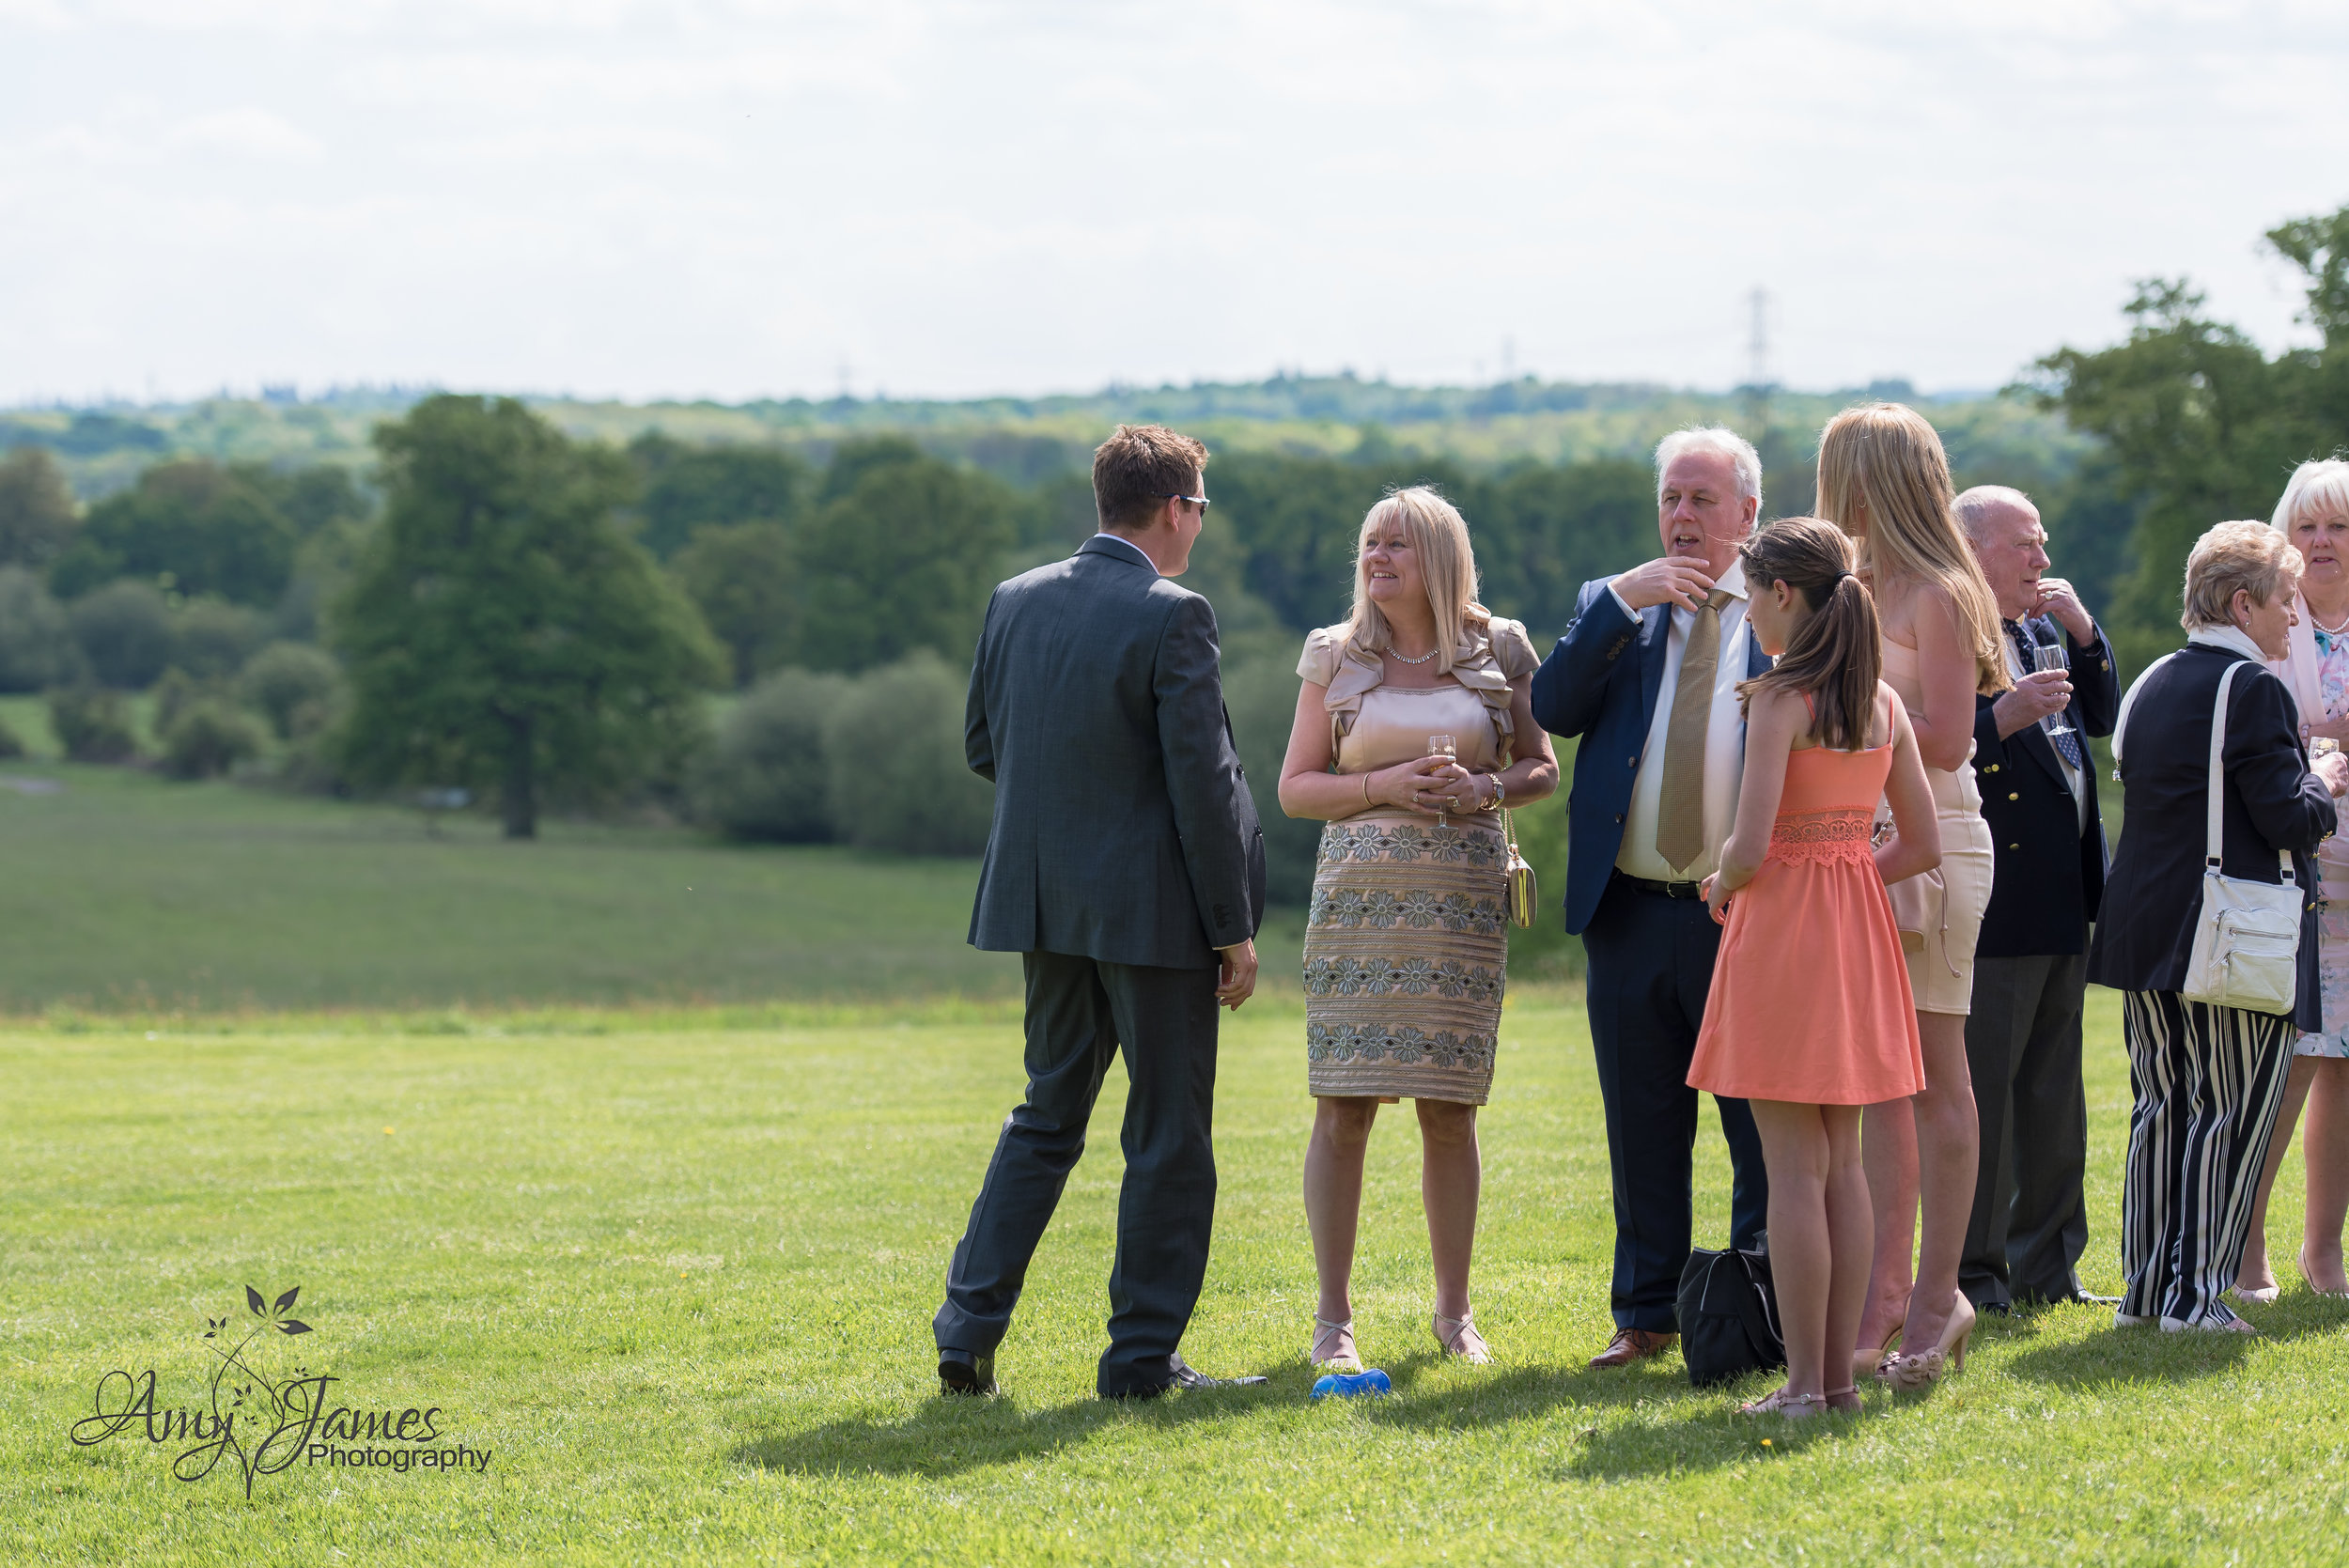 Highfield Park wedding venue | Hampshire wedding photographer | Amy James Photography Fleet wedding photographer | UK outdoor wedding venue